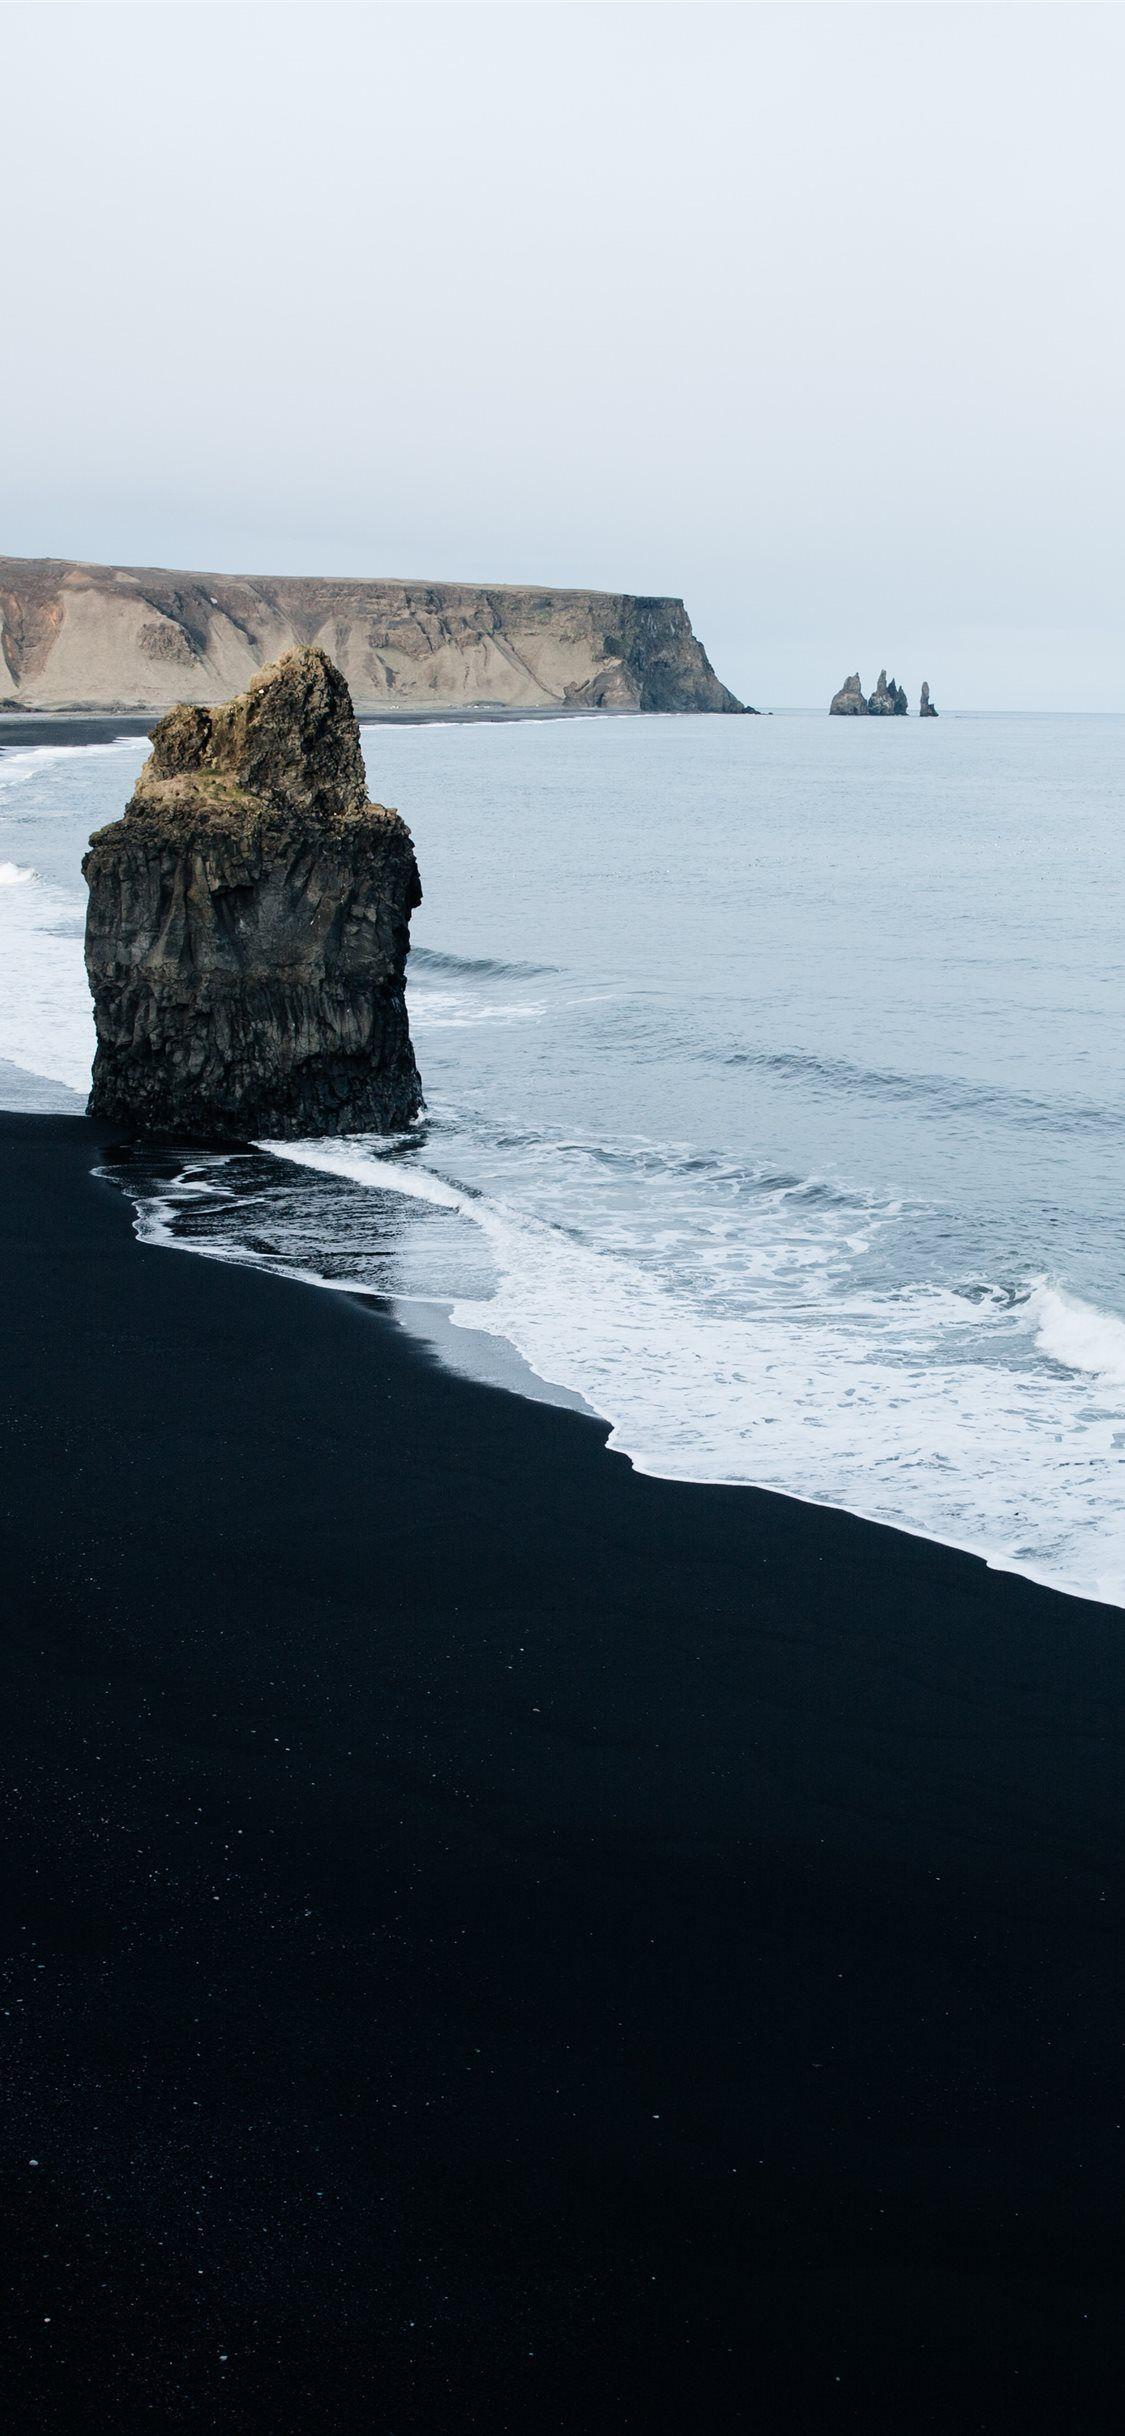 brown monolith rock on seashore iPhone 11 Wallpapers in